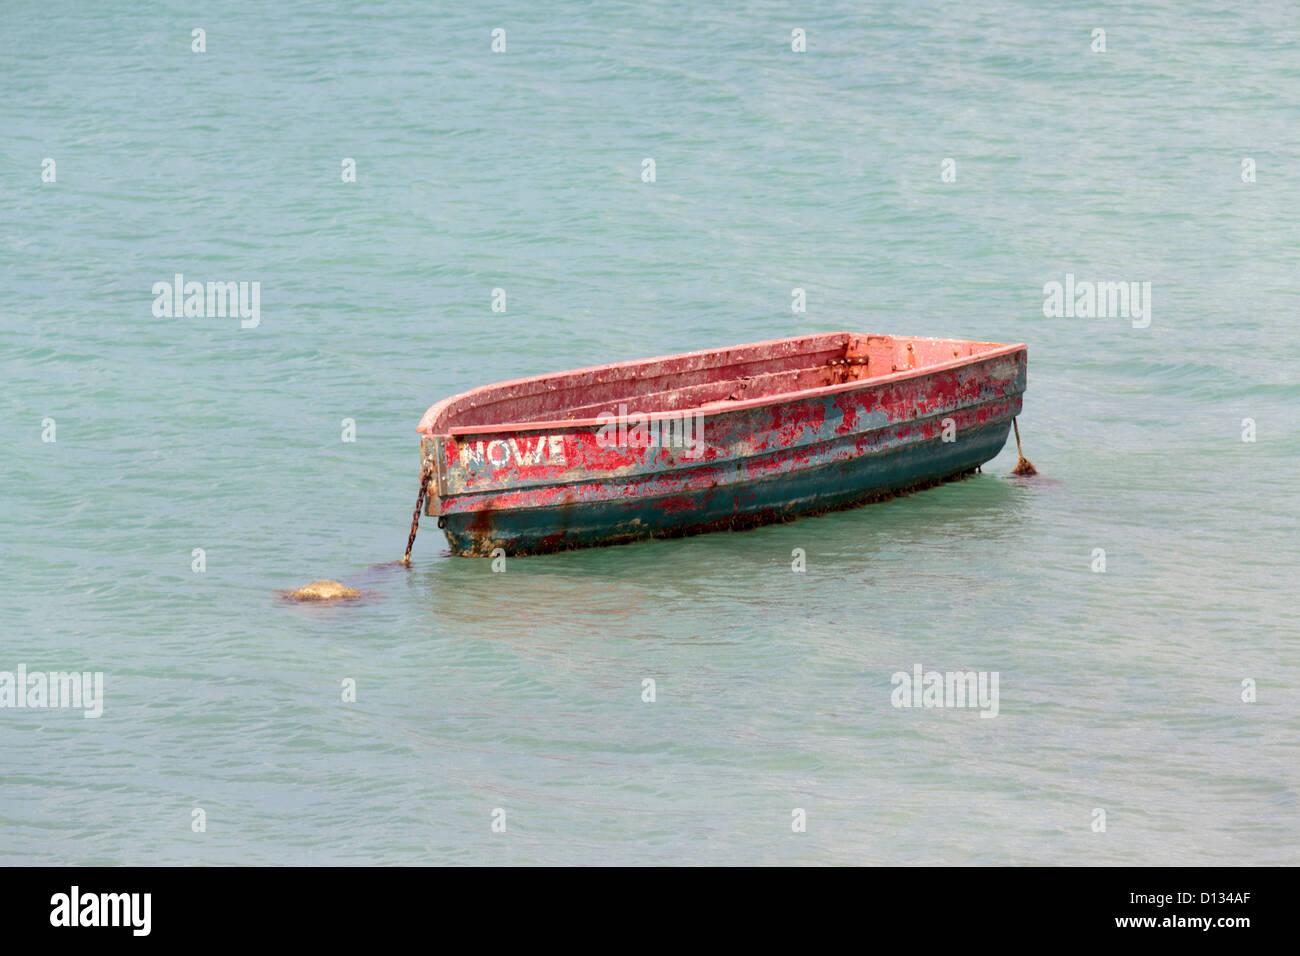 Petit bateau à rames vieillies Paarden Baai Oranjestad Aruba Photo Stock